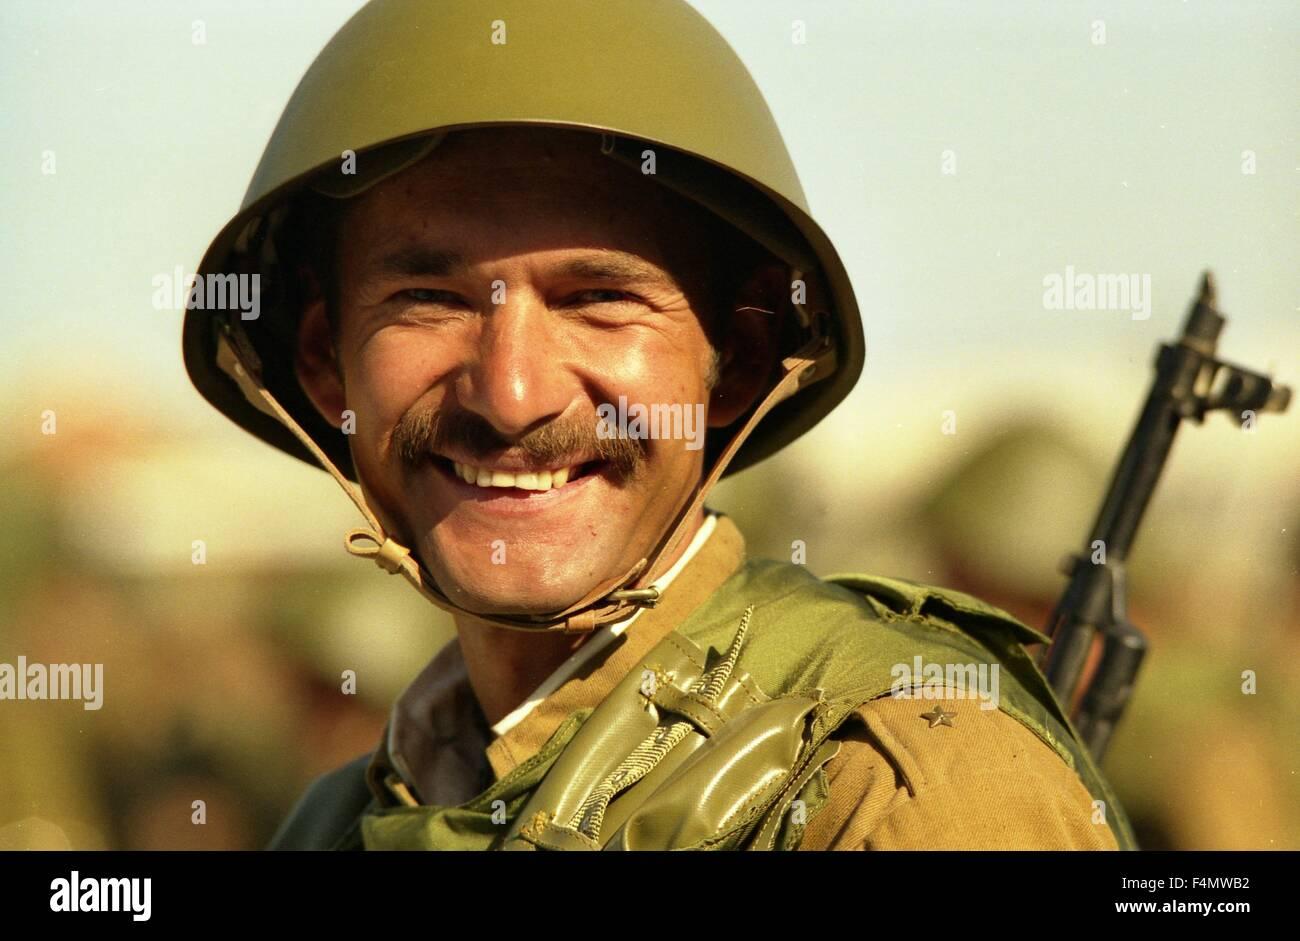 Soviet Afghanistan war - Page 6 Afghanistan-the-afghan-soldier-F4MWB2